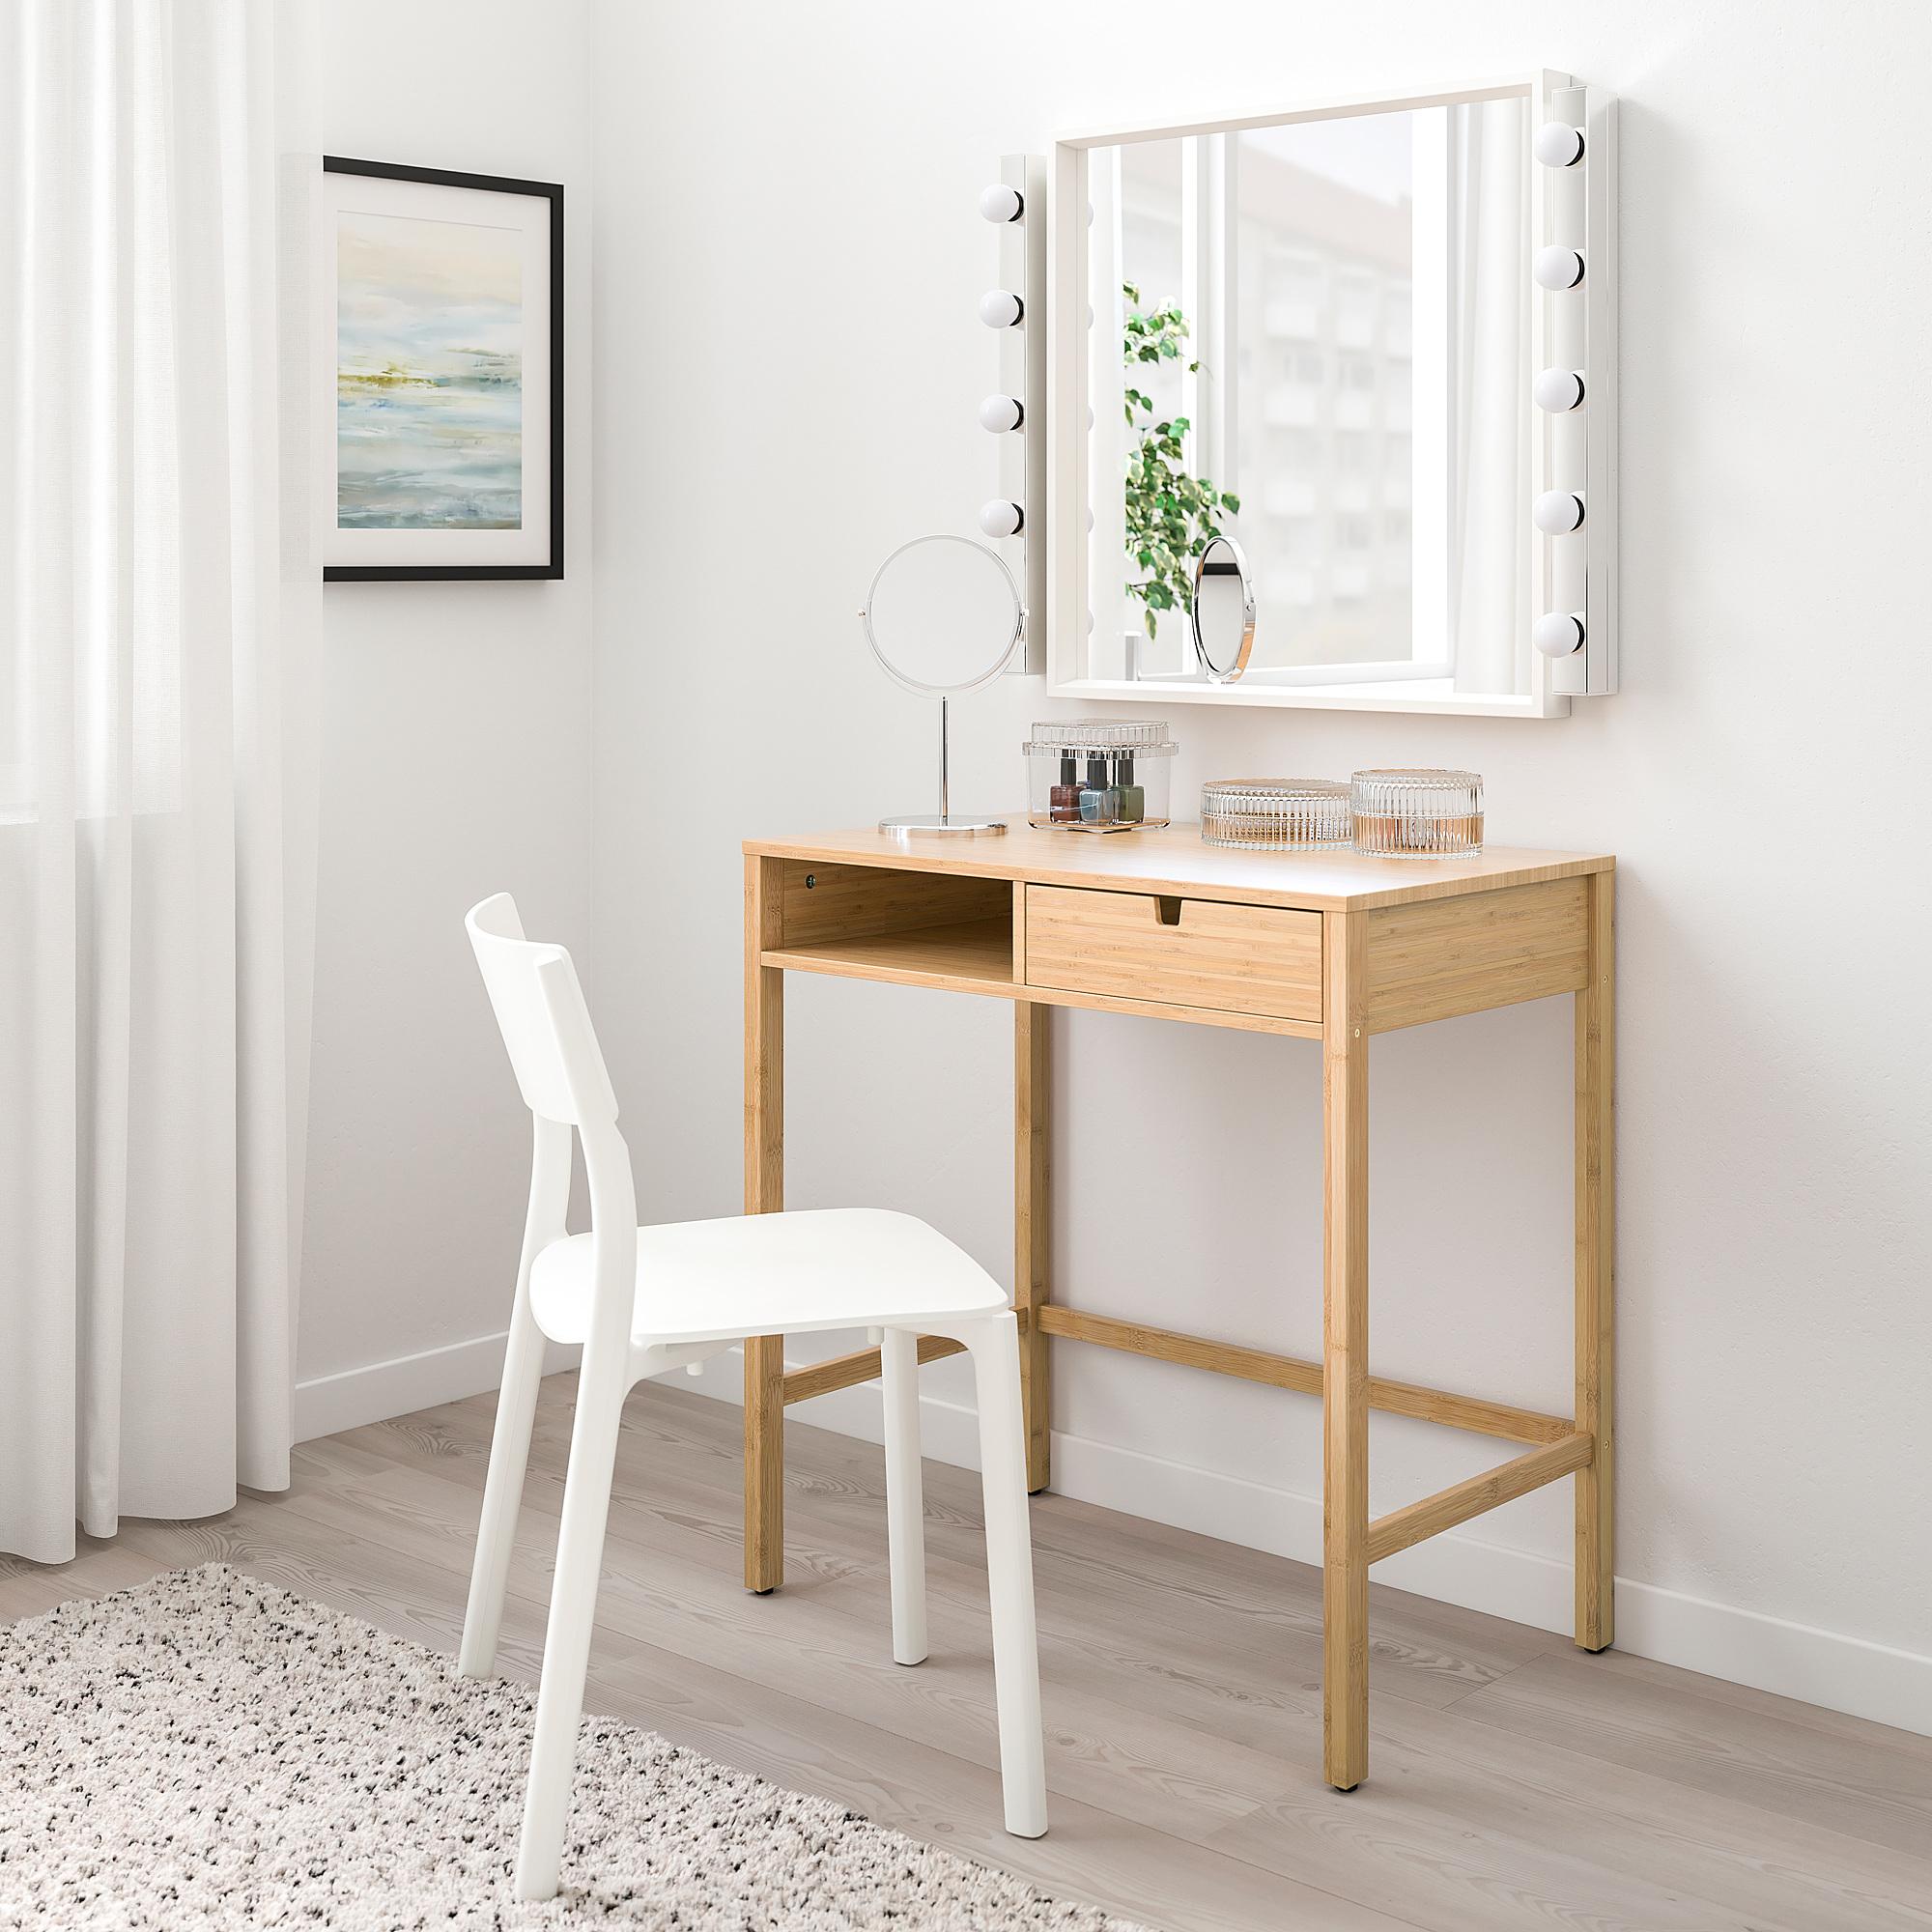 Nordkisa Dressing Table Bamboo Ikea Indonesia